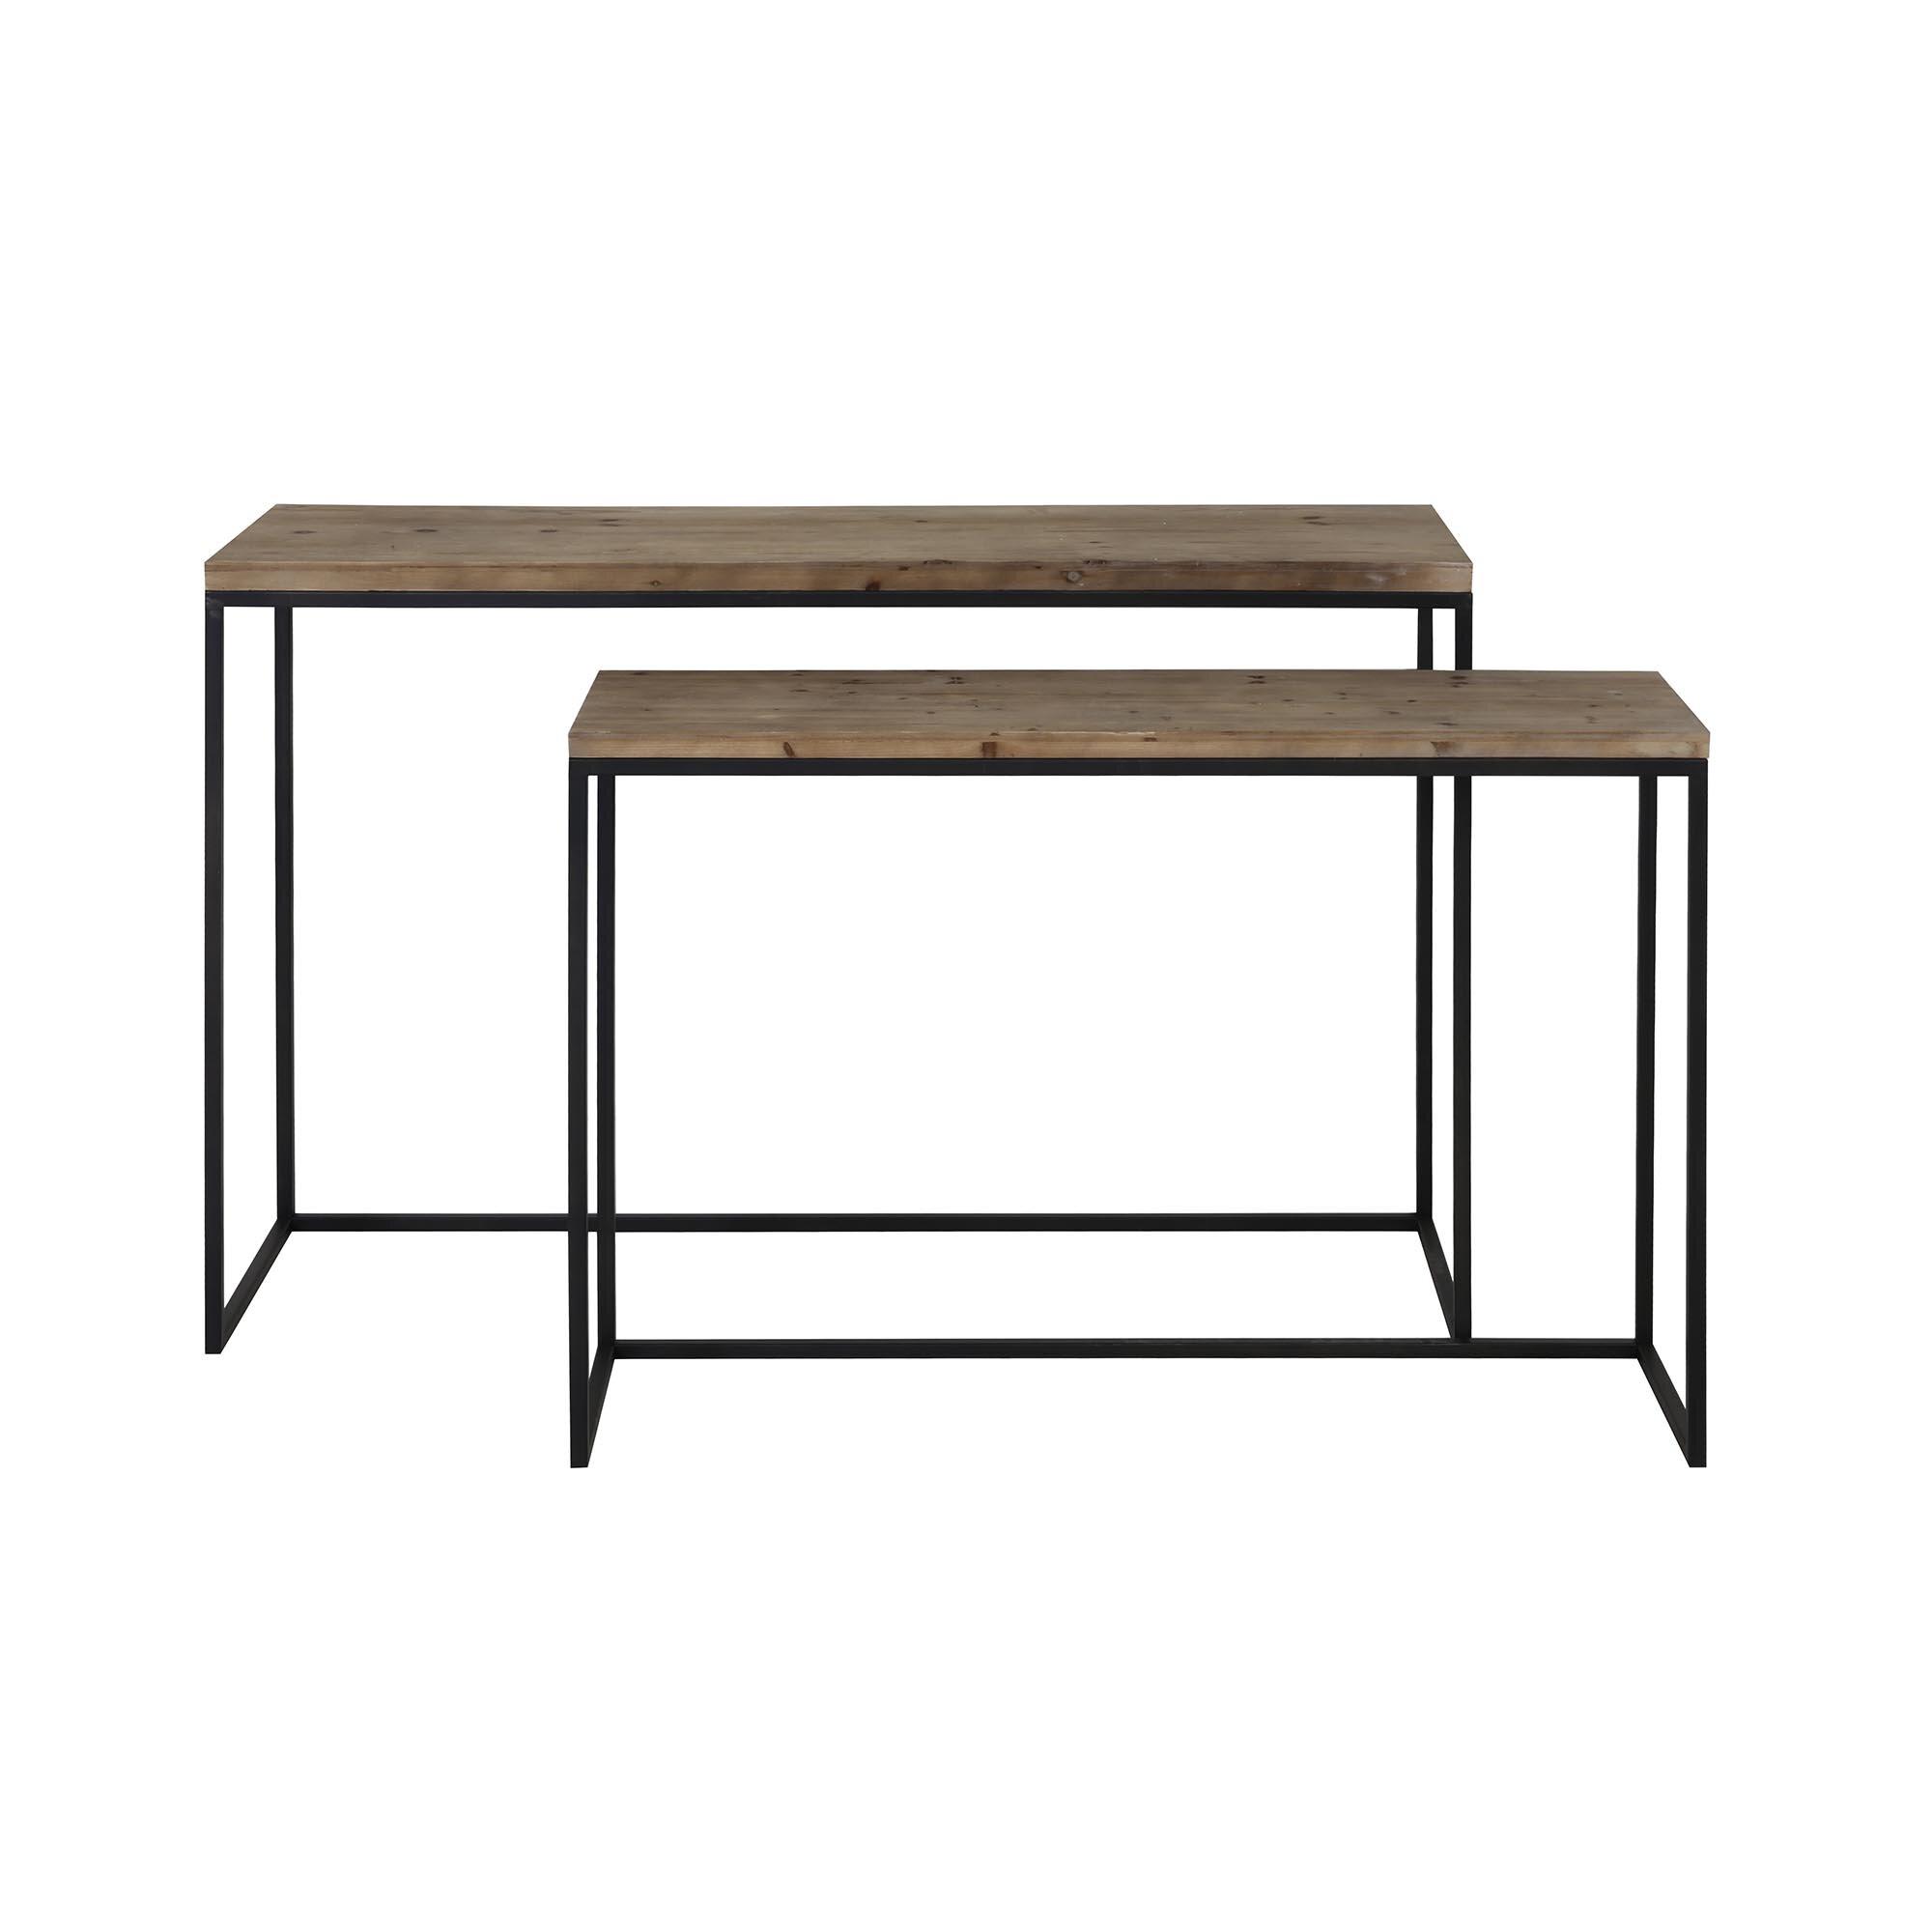 Williston Forge Conover 2 Piece Console Table Set Wayfair Co Uk